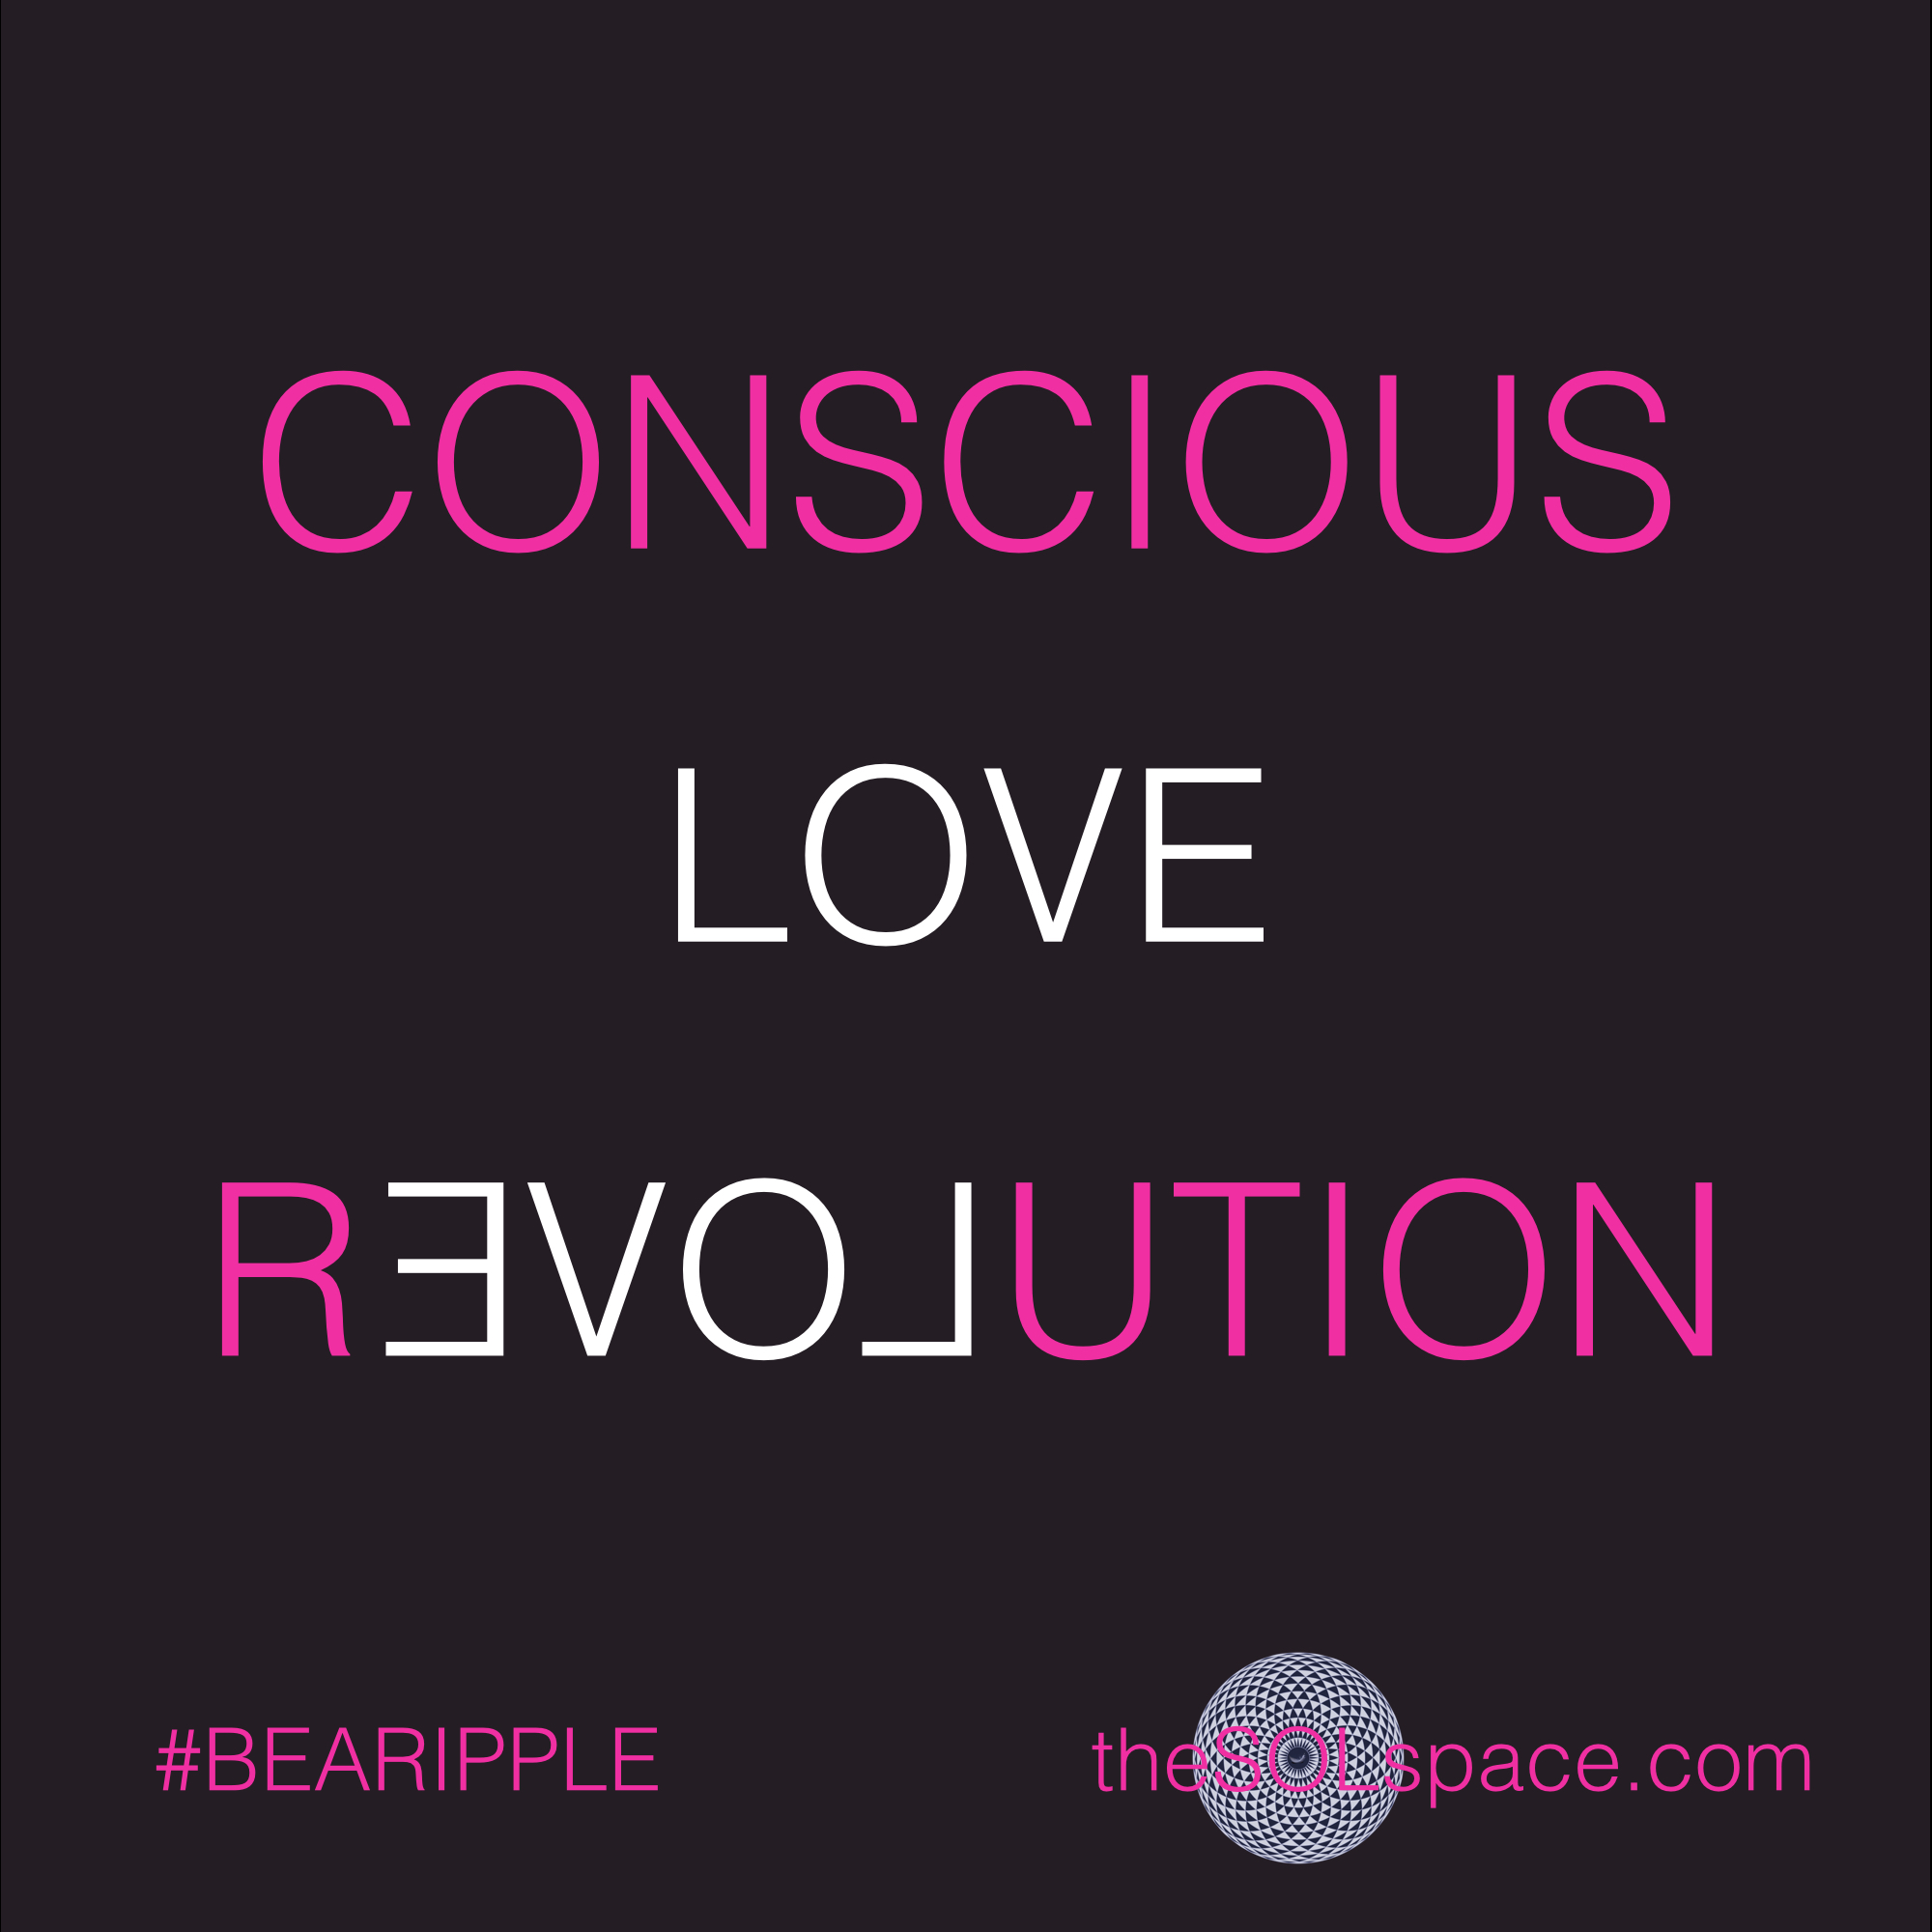 #BeARipple..Conscious love Revolution @theSOLspace